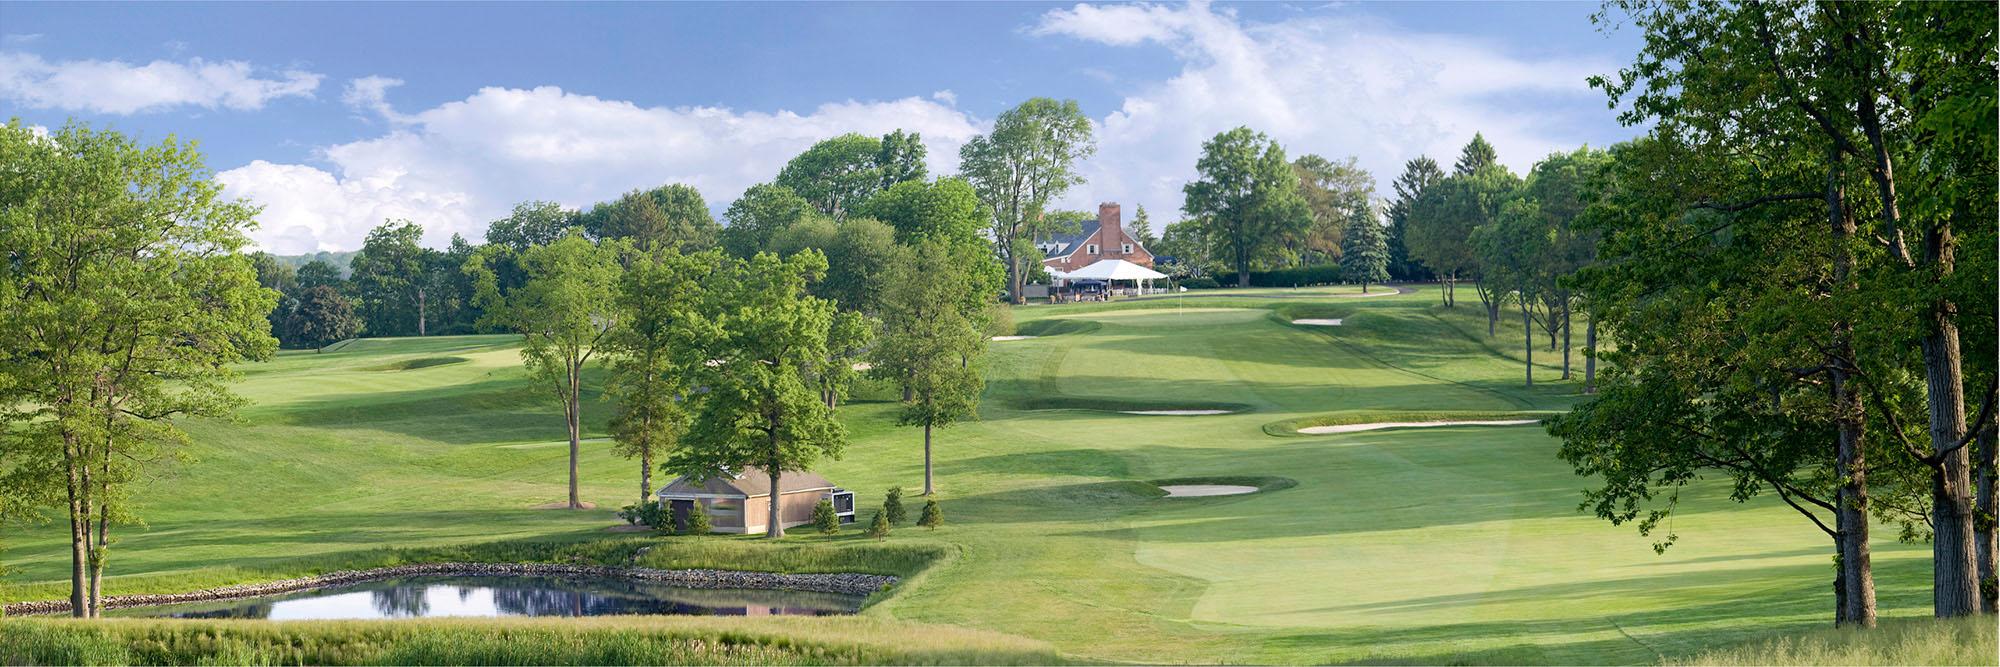 Golf Course Image - Essex County Country Club No. 18